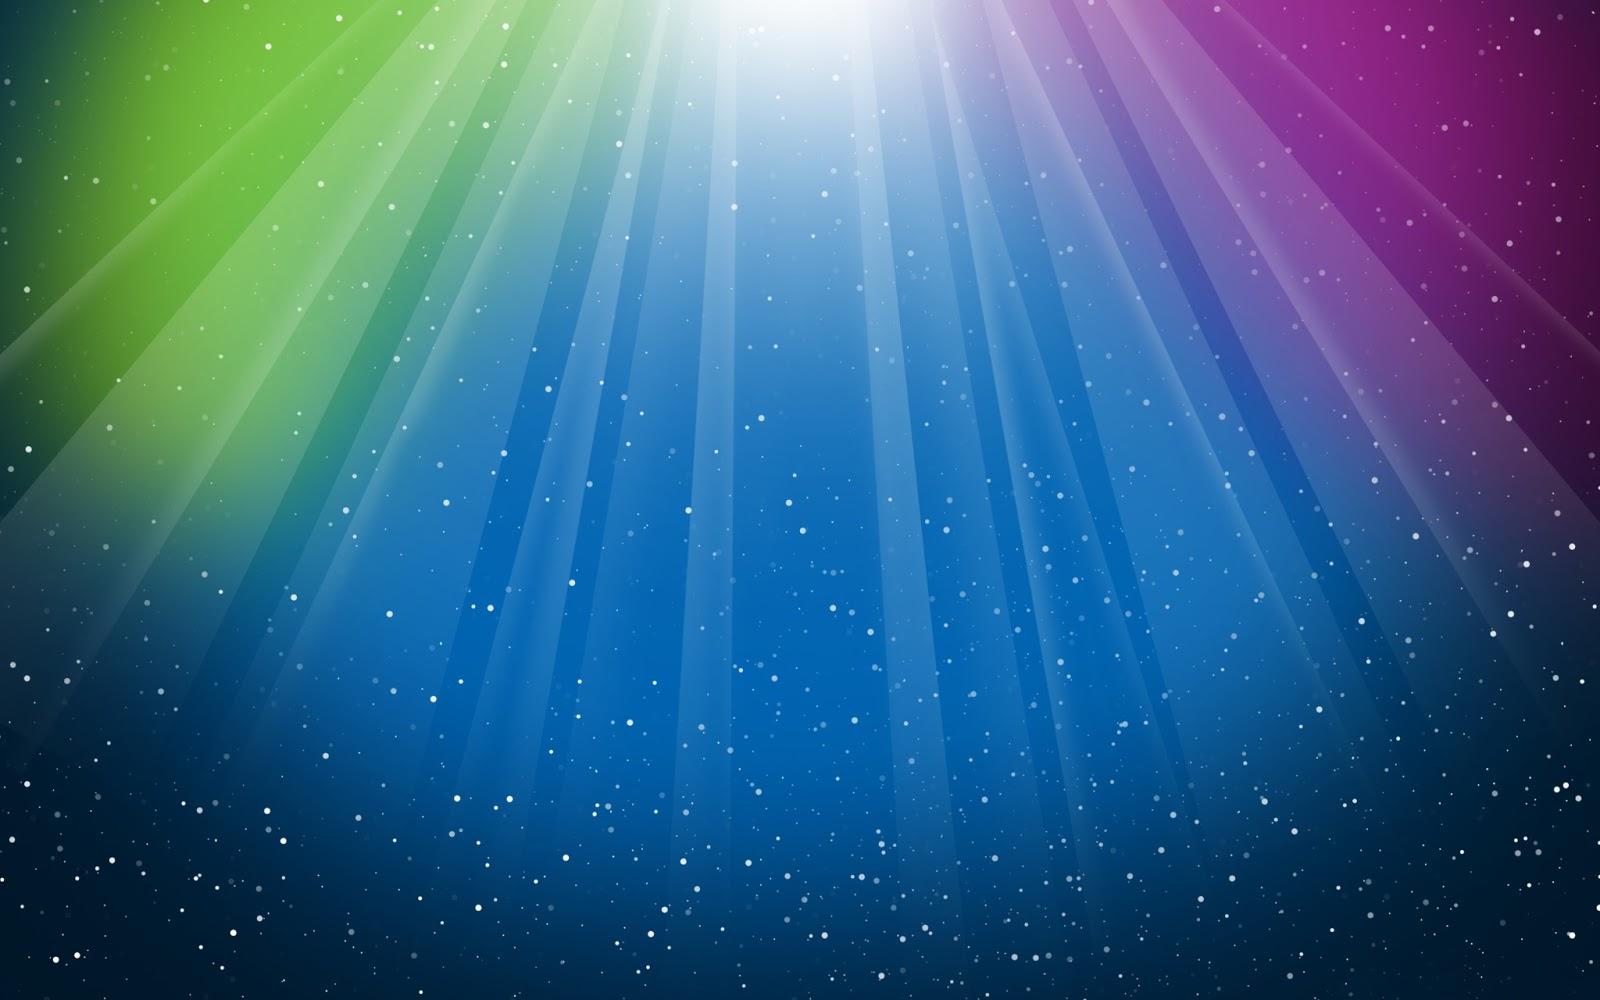 Aurora Burst Blue Green Multy Color Background Wallpaperz